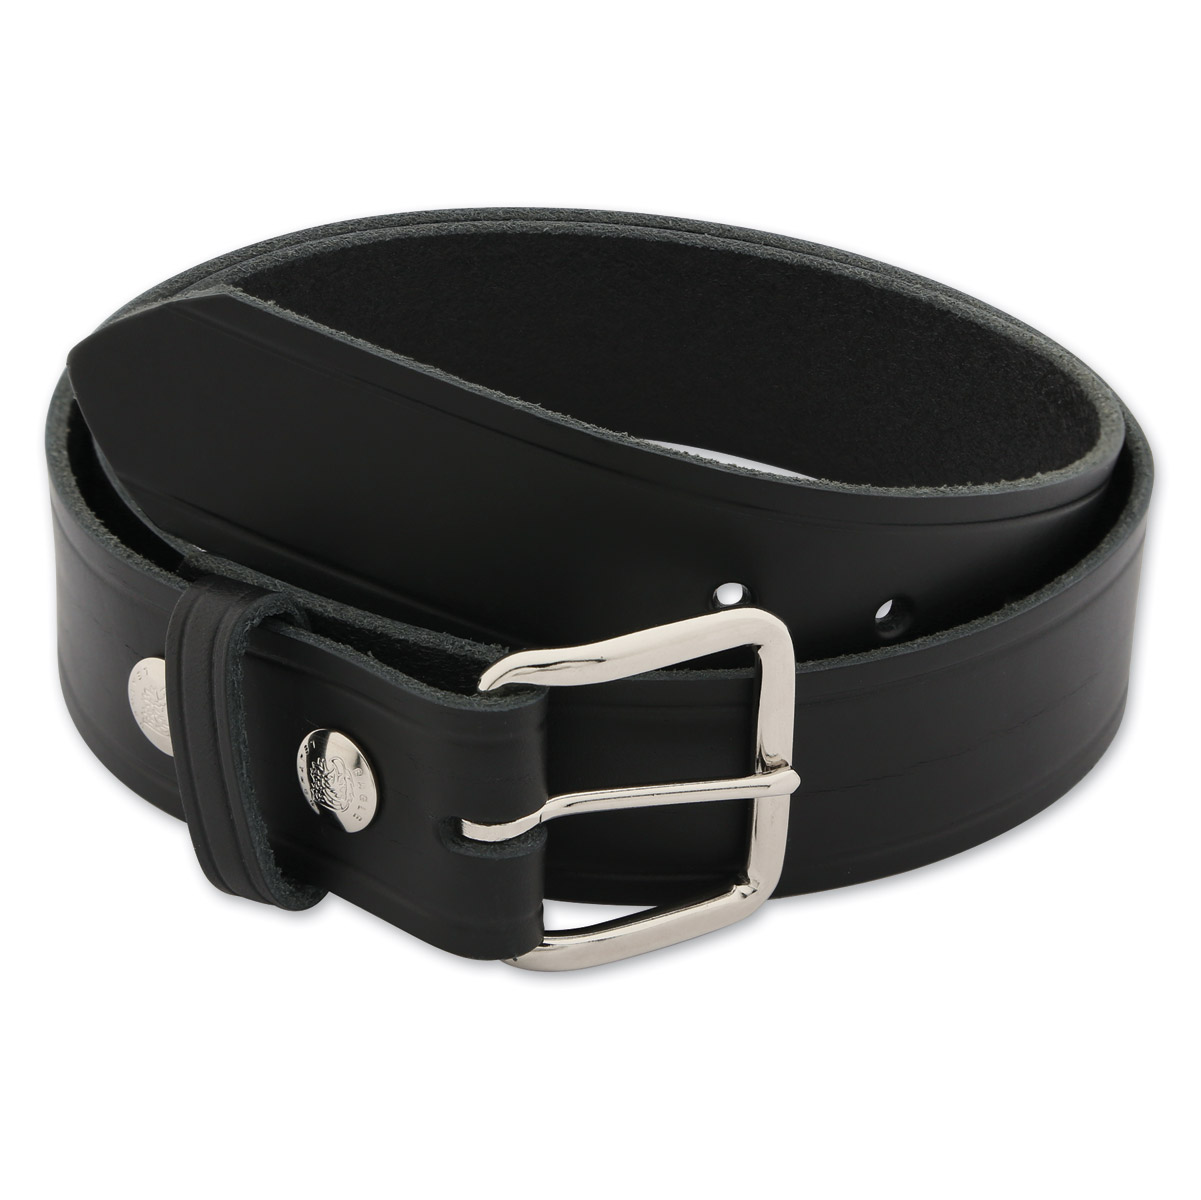 Eagle Leather Belt